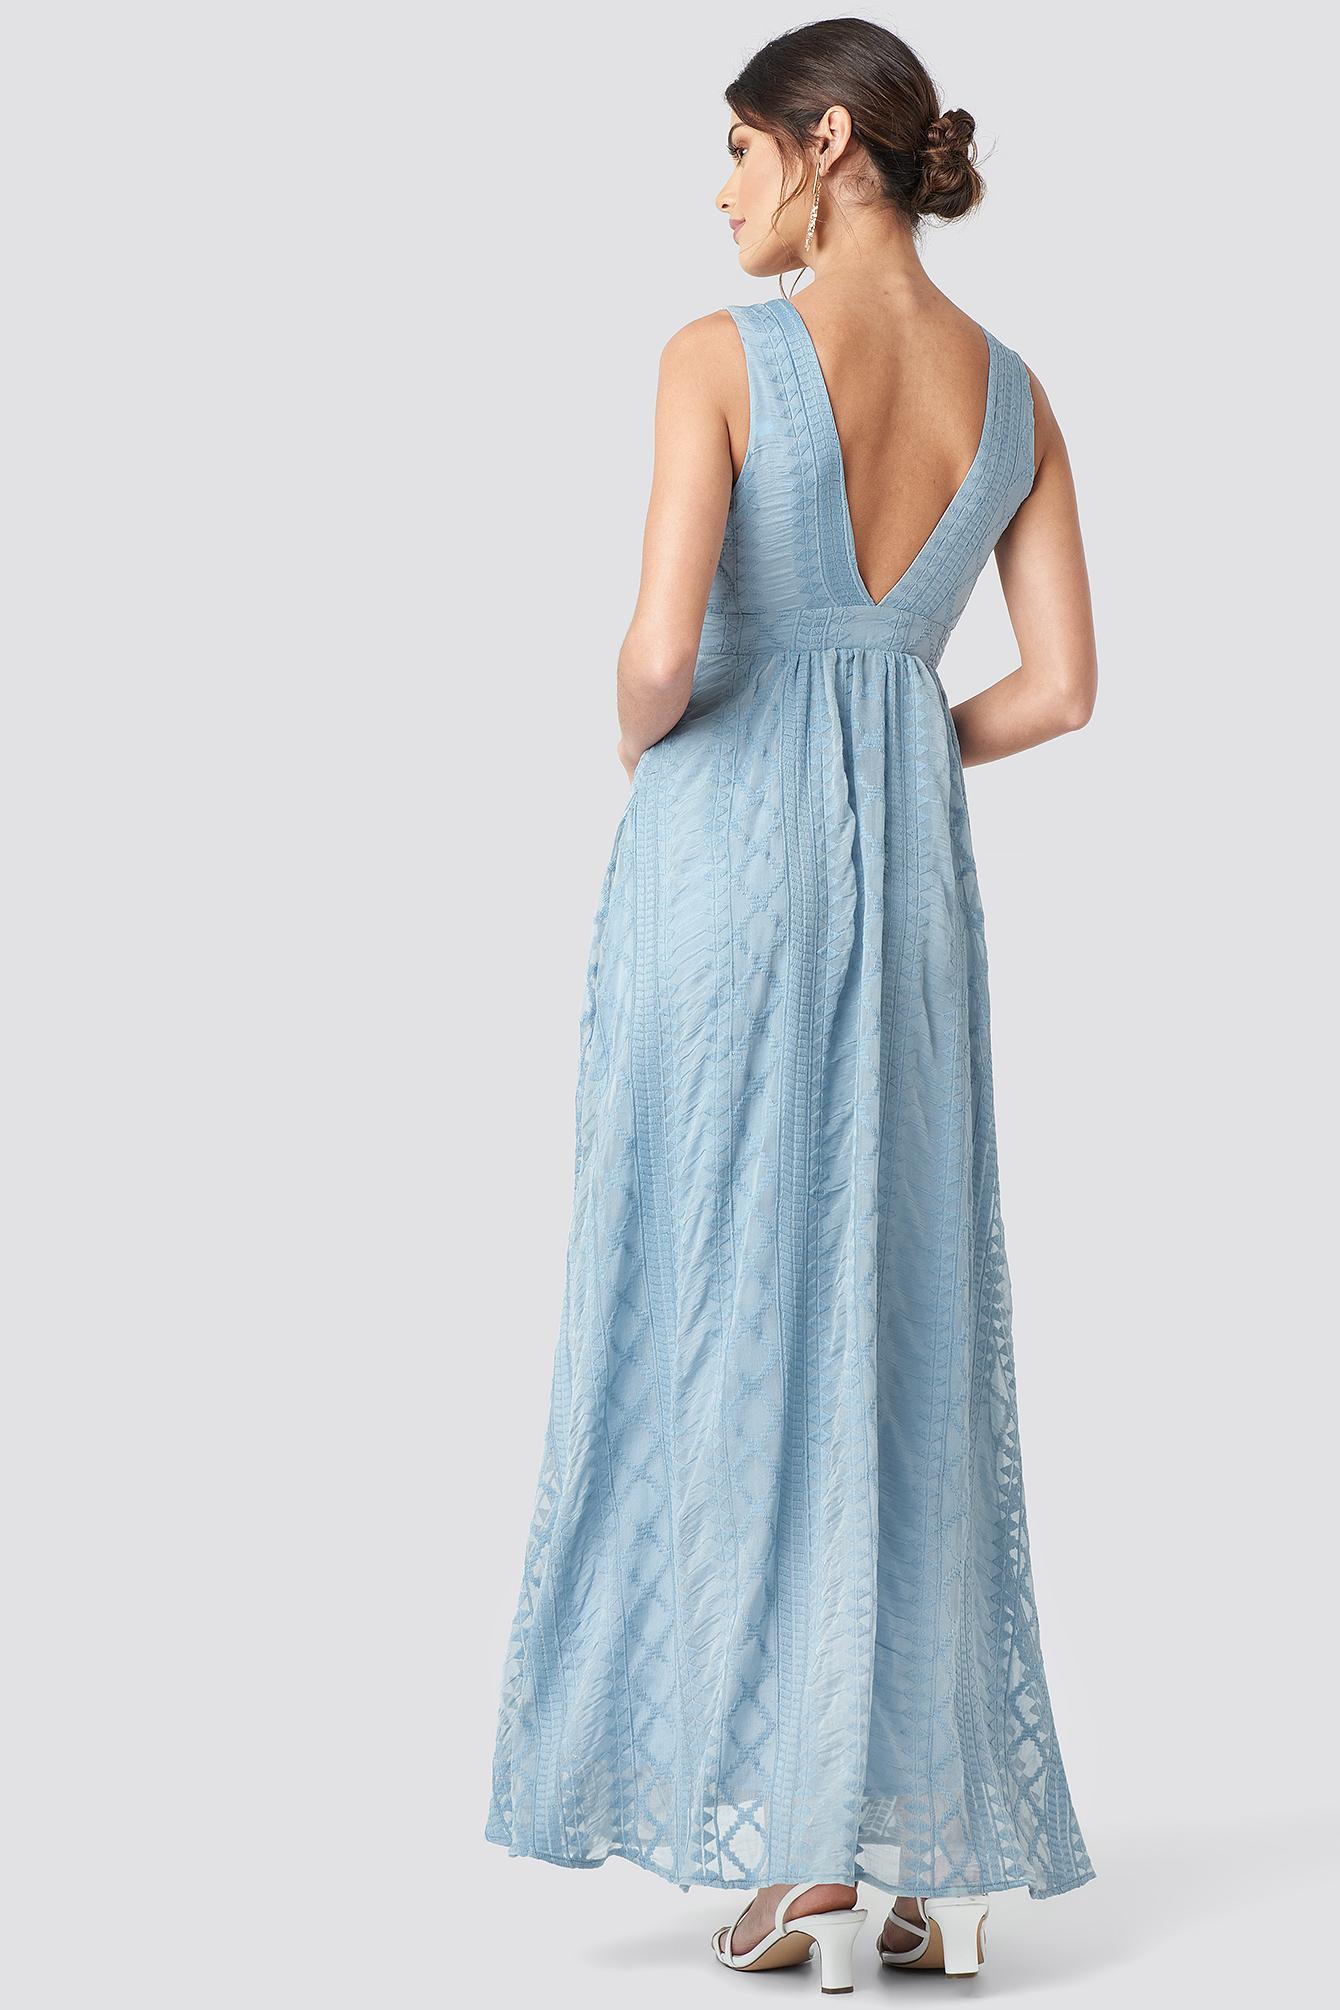 V-neck Embroidery Maxi Dress NA-KD.COM